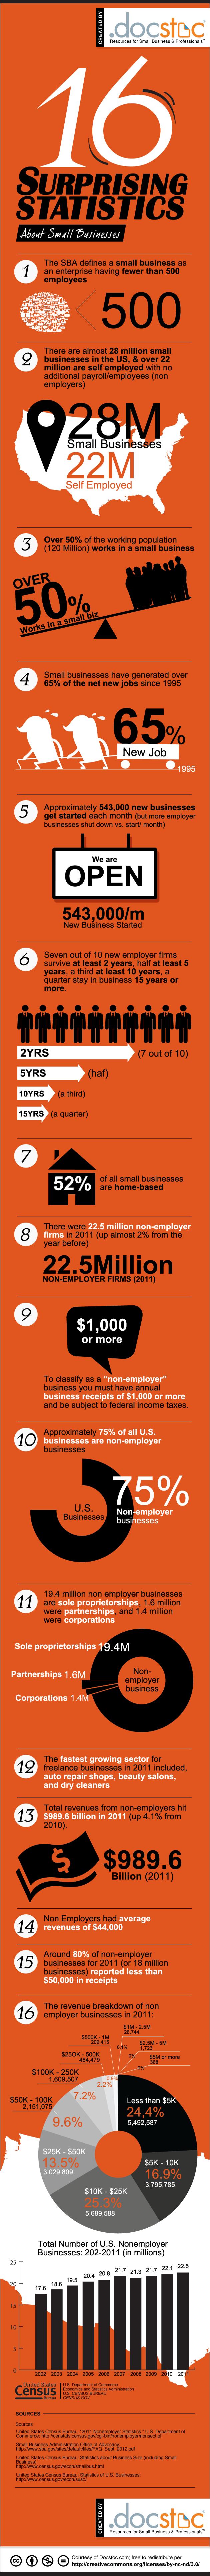 Small-Businesses-in-America